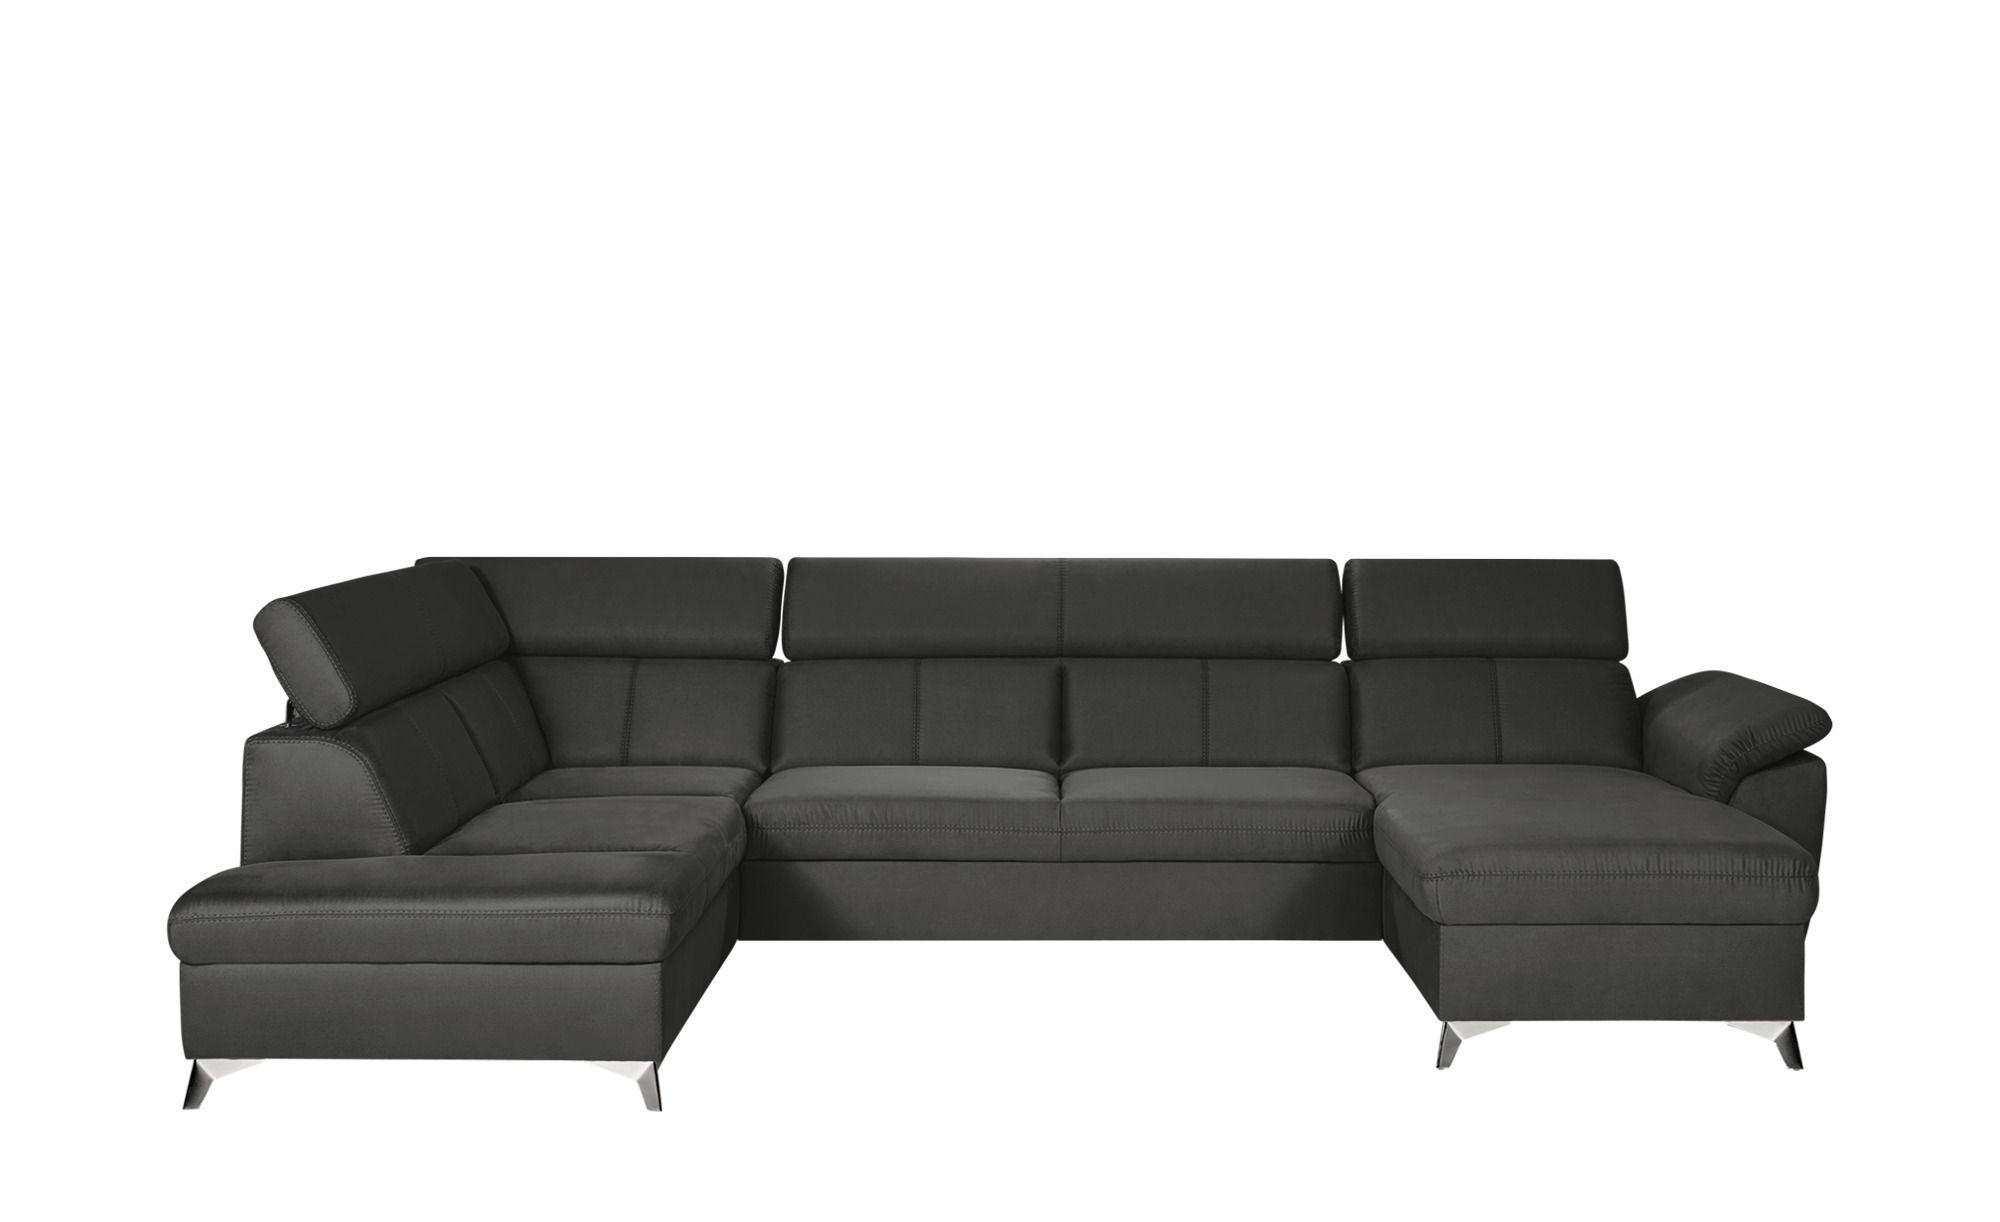 sofa online kaufen erfahrungen. Black Bedroom Furniture Sets. Home Design Ideas